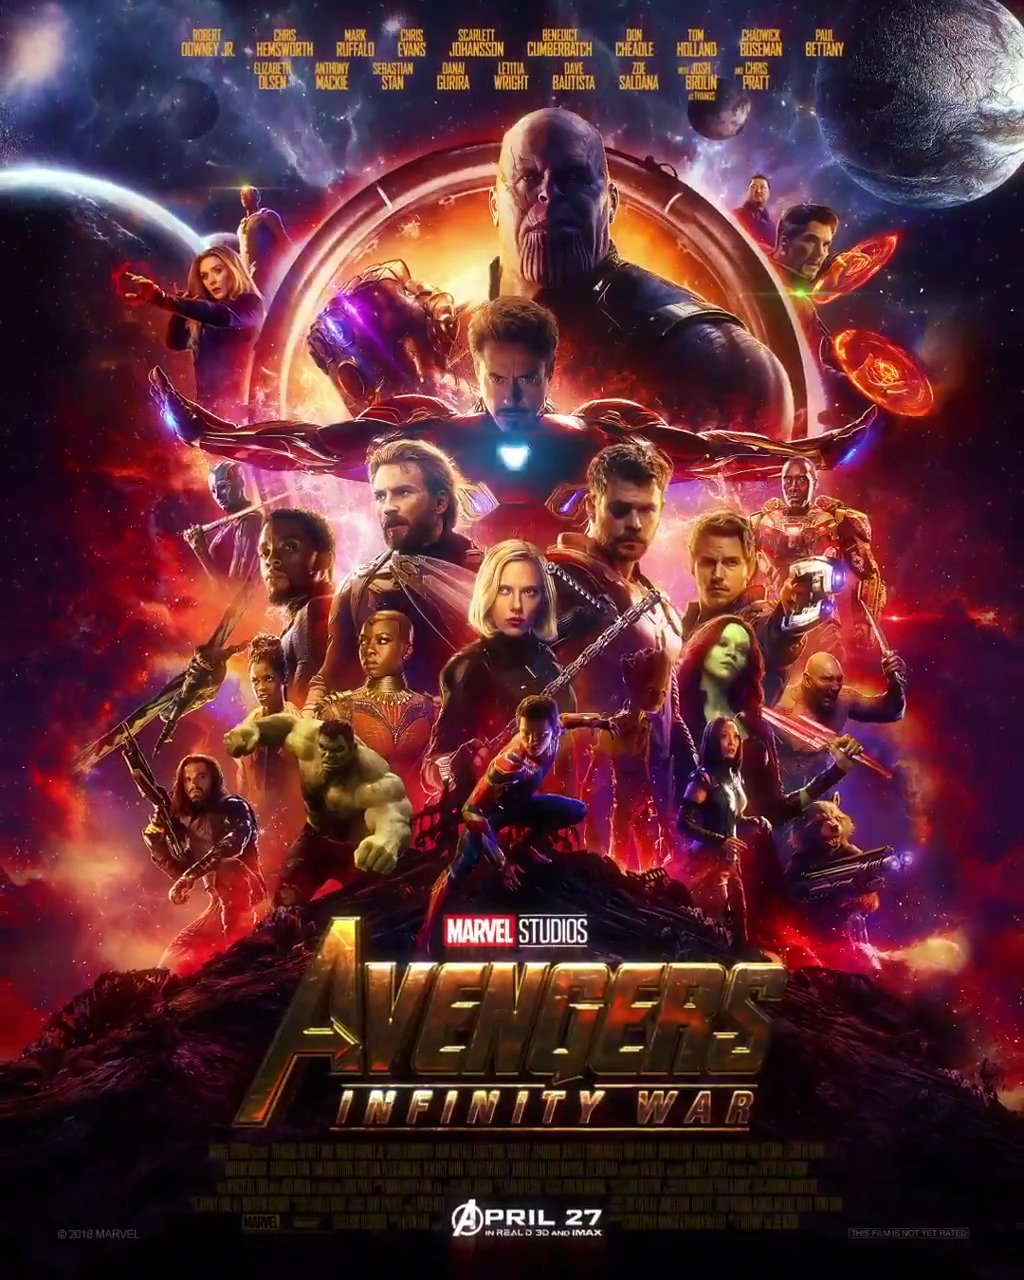 Destiny arrives. Get tickets to Marvel Studios' 'Avengers: #InfinityWar' now: https://t.co/kctg8VkHan https://t.co/u6BrgFOqhc